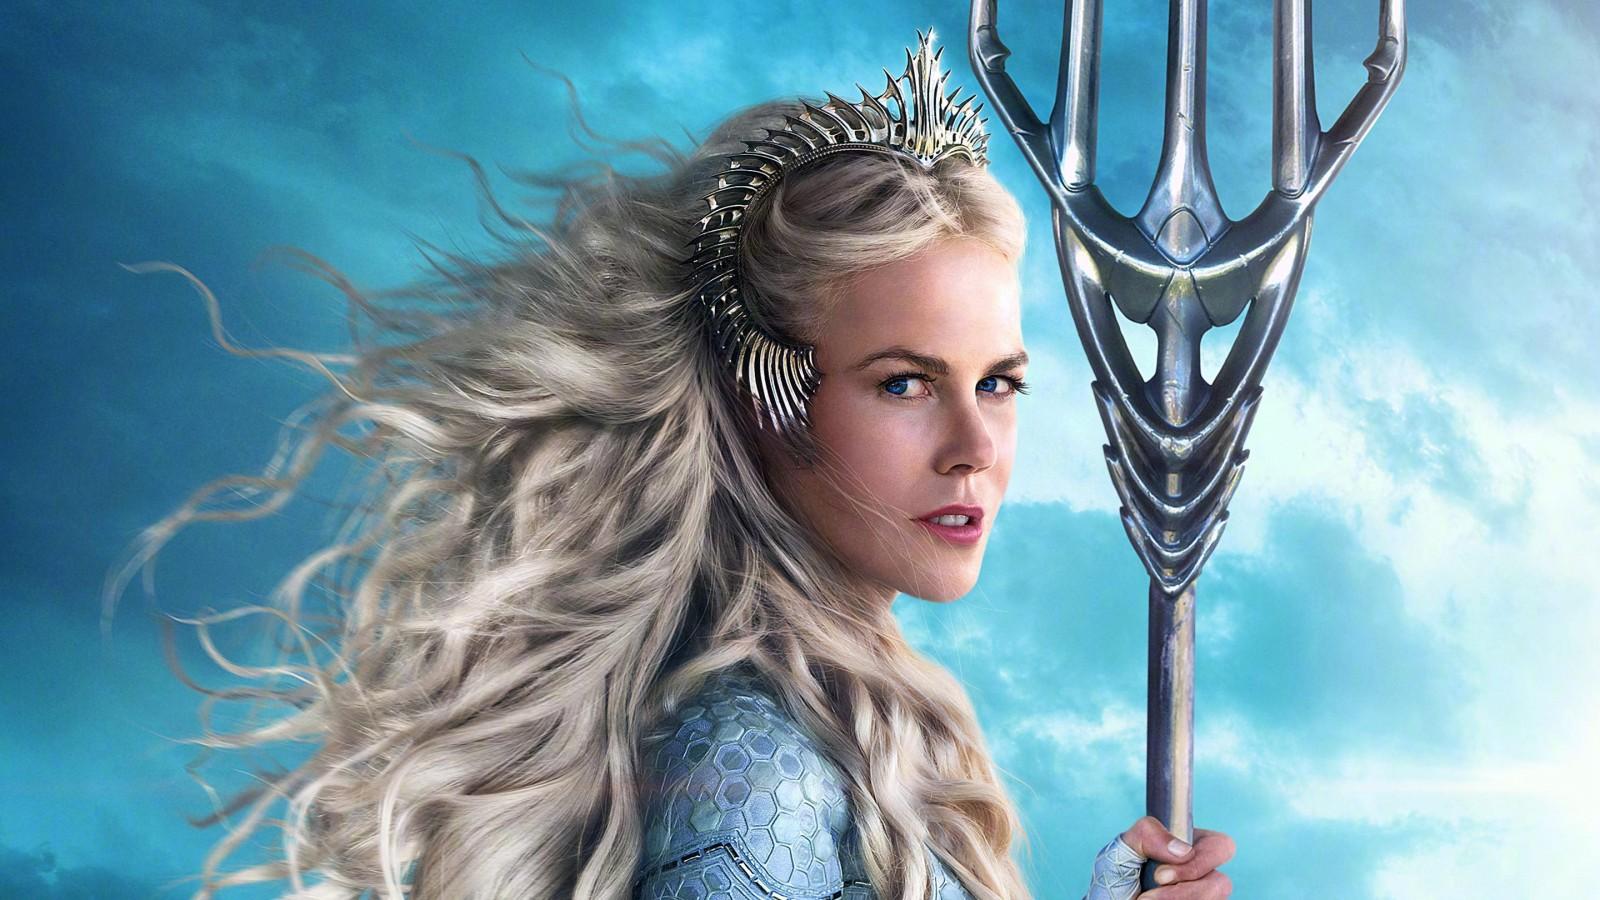 Iphone 6 Plus Wallpaper Cute Nicole Kidman As Queen Atlanna In Aquaman Wallpapers Hd